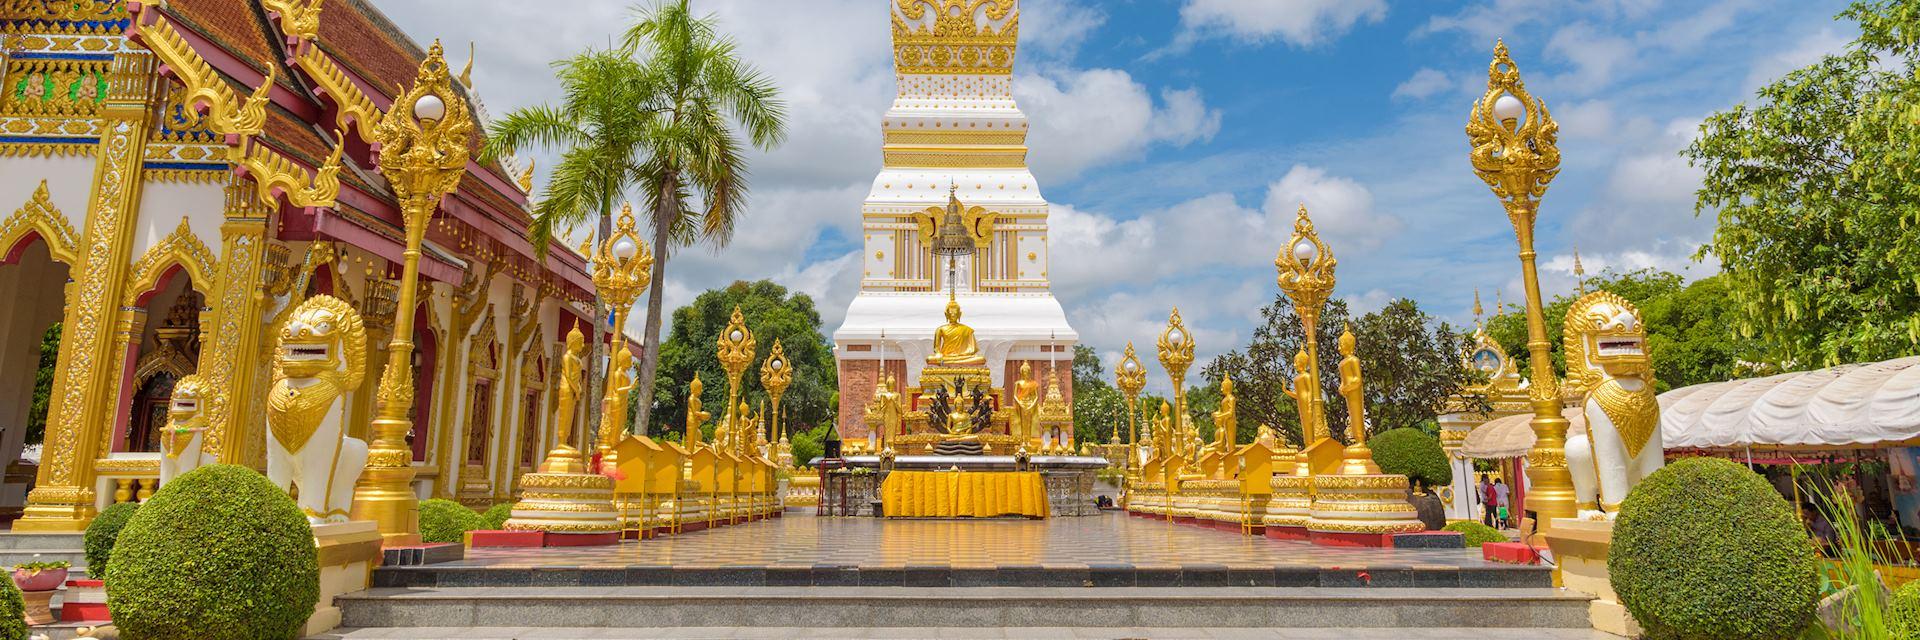 Wat Phra That Phanom temple, Nakhon Phanom